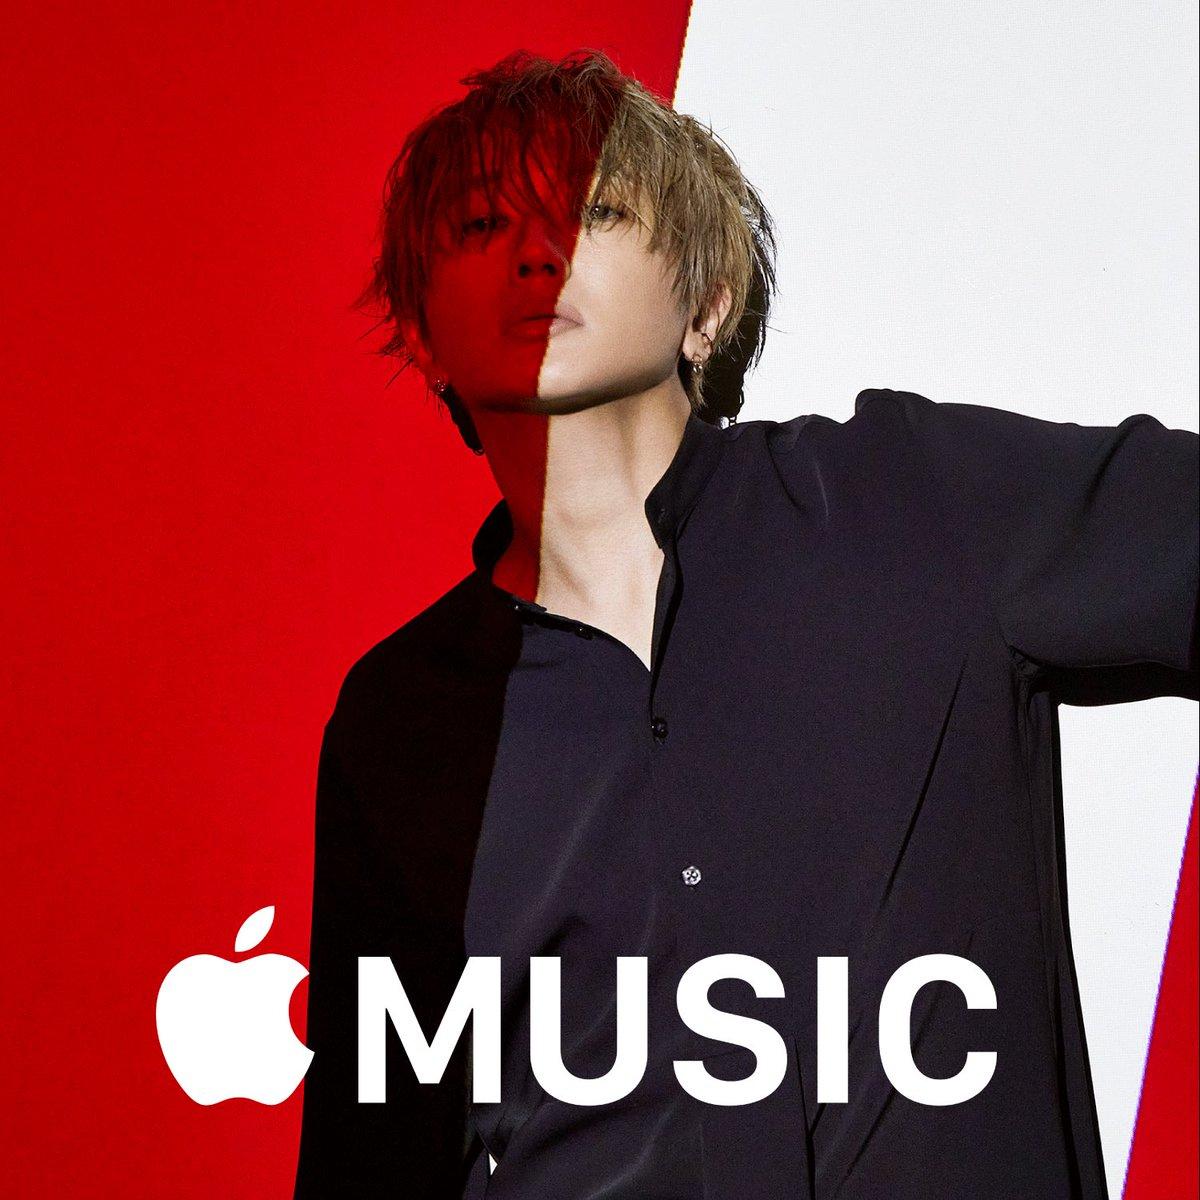 New Single「Get You Back」本日からApple Music @AppleMusic @AppleMusicJapan でも楽曲配信がスタート♪MVは本日20:00《プレミア公開》🎞#Nissy#西島隆弘#Nsy#GetYouBack#Nissyの日#iTunes総合ソングランキング1位🏅🙌